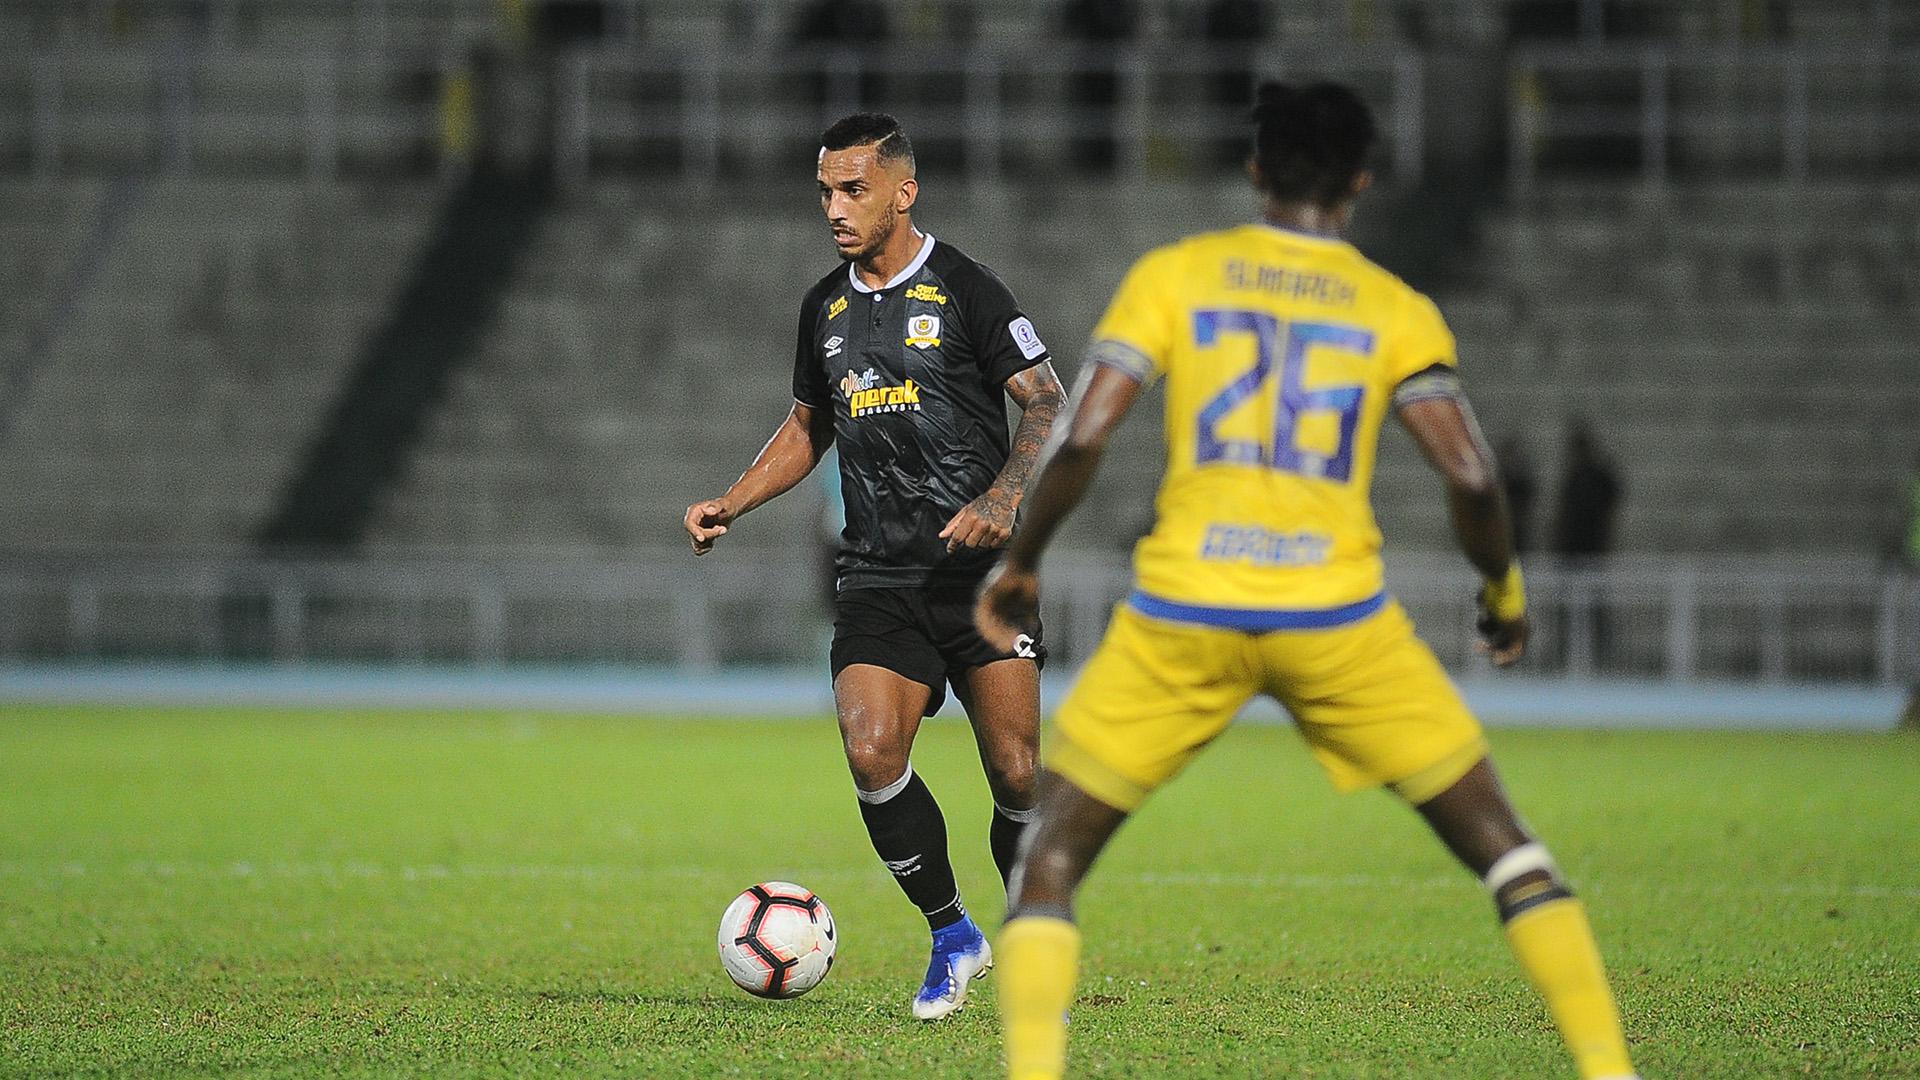 Leandro dos Santos, Pahang v Perak, Malaysia FA Cup, 21 Jun 2019